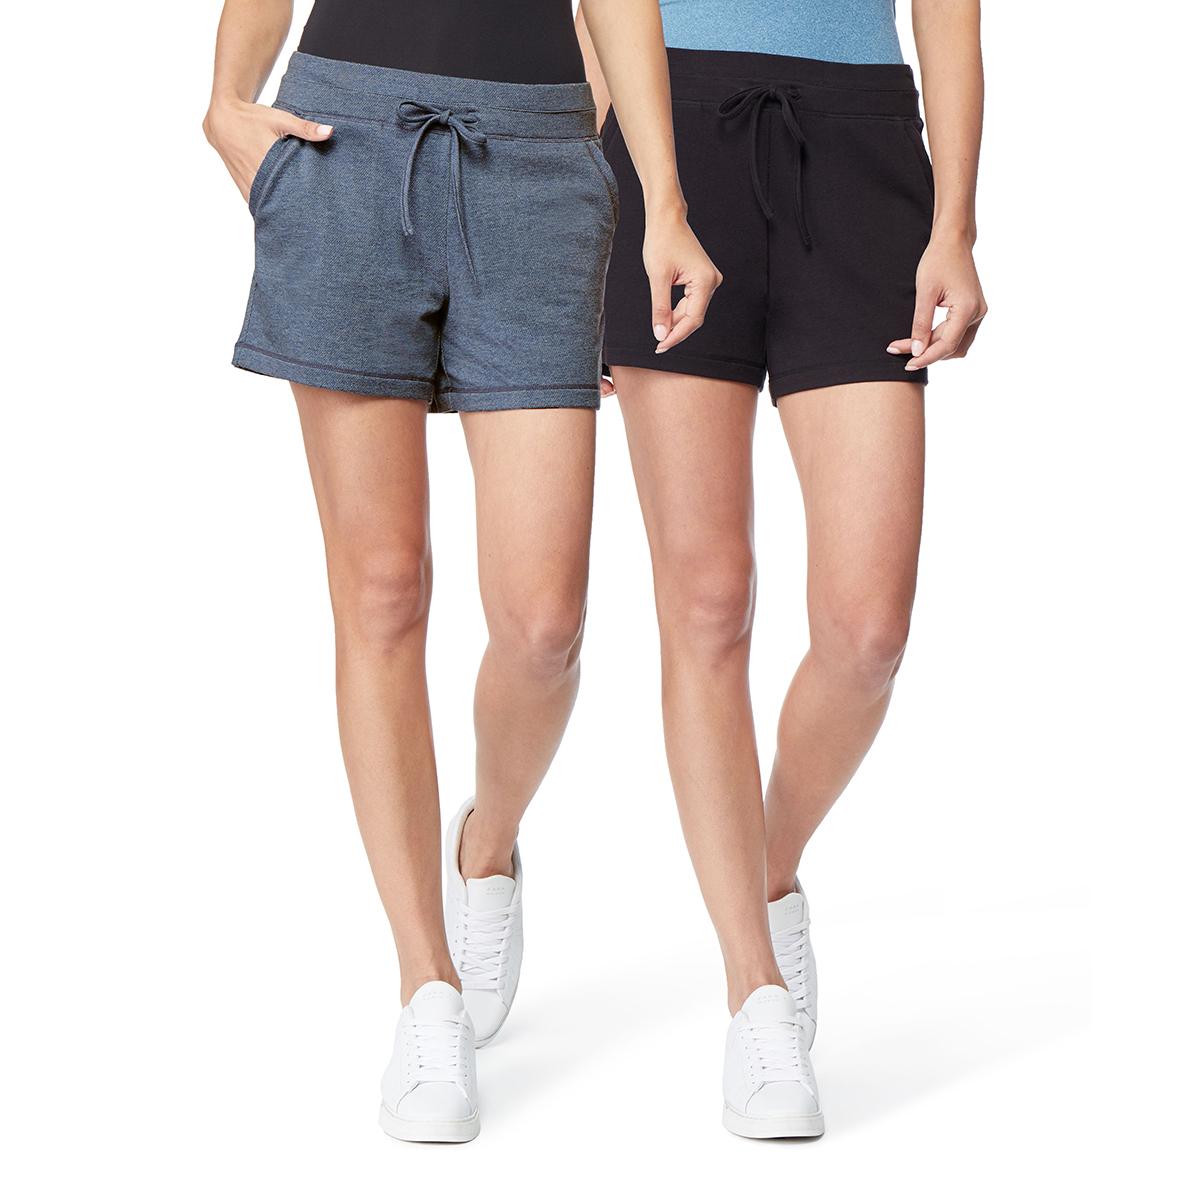 Costco: Paquete de 2 Shorts 32 Degrees Cool, para Dama